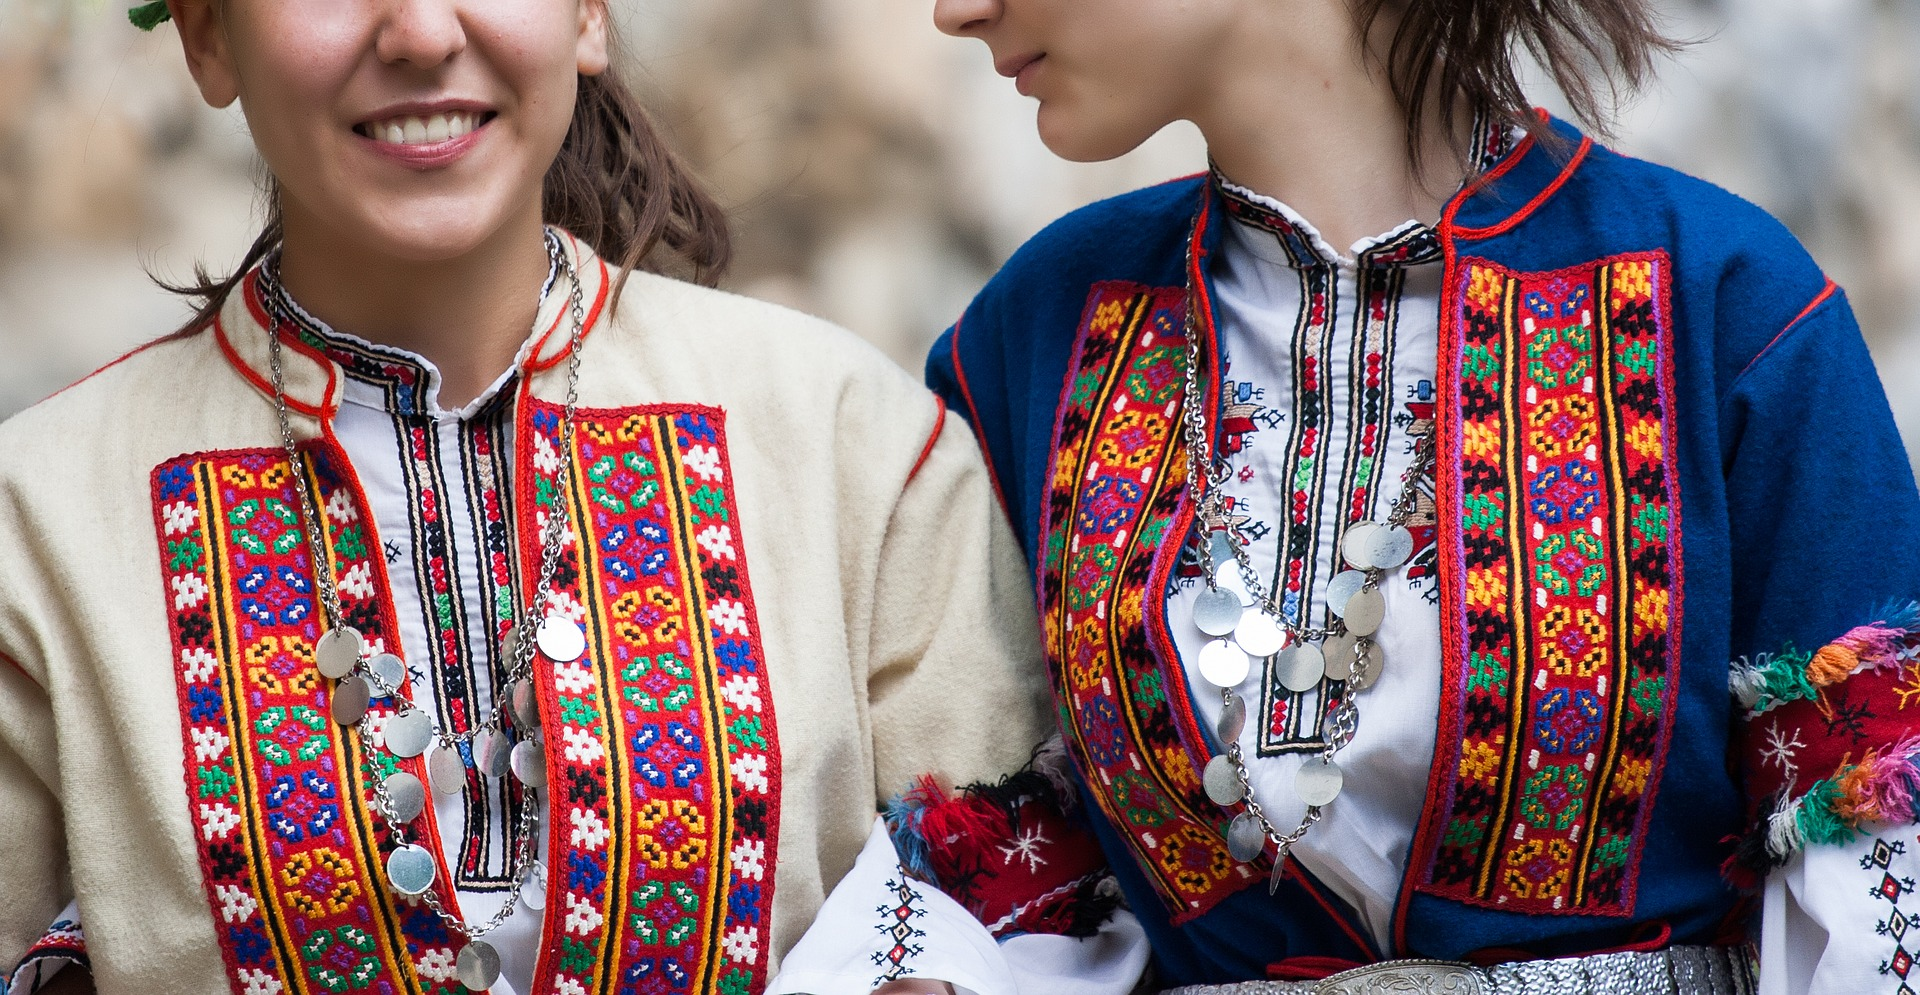 Bulgaria – Covid-19